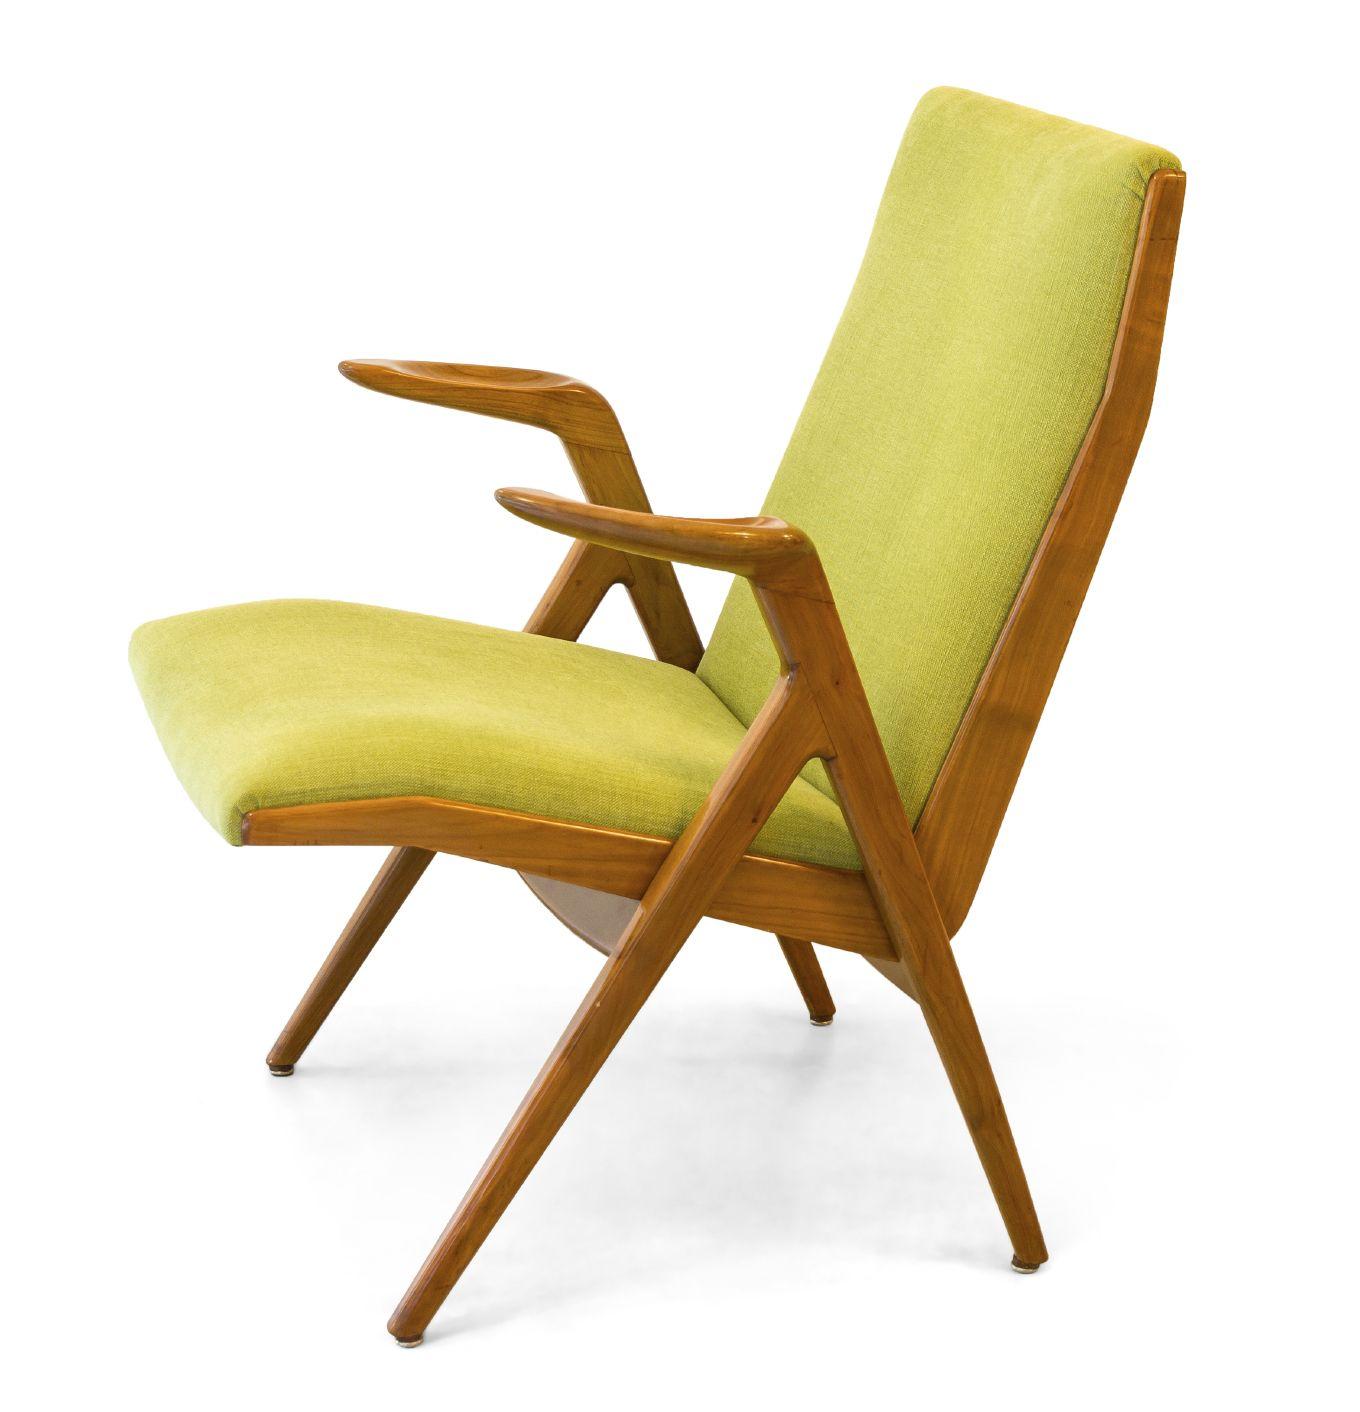 Midcentury modern yellow danish chair mid century pinterest